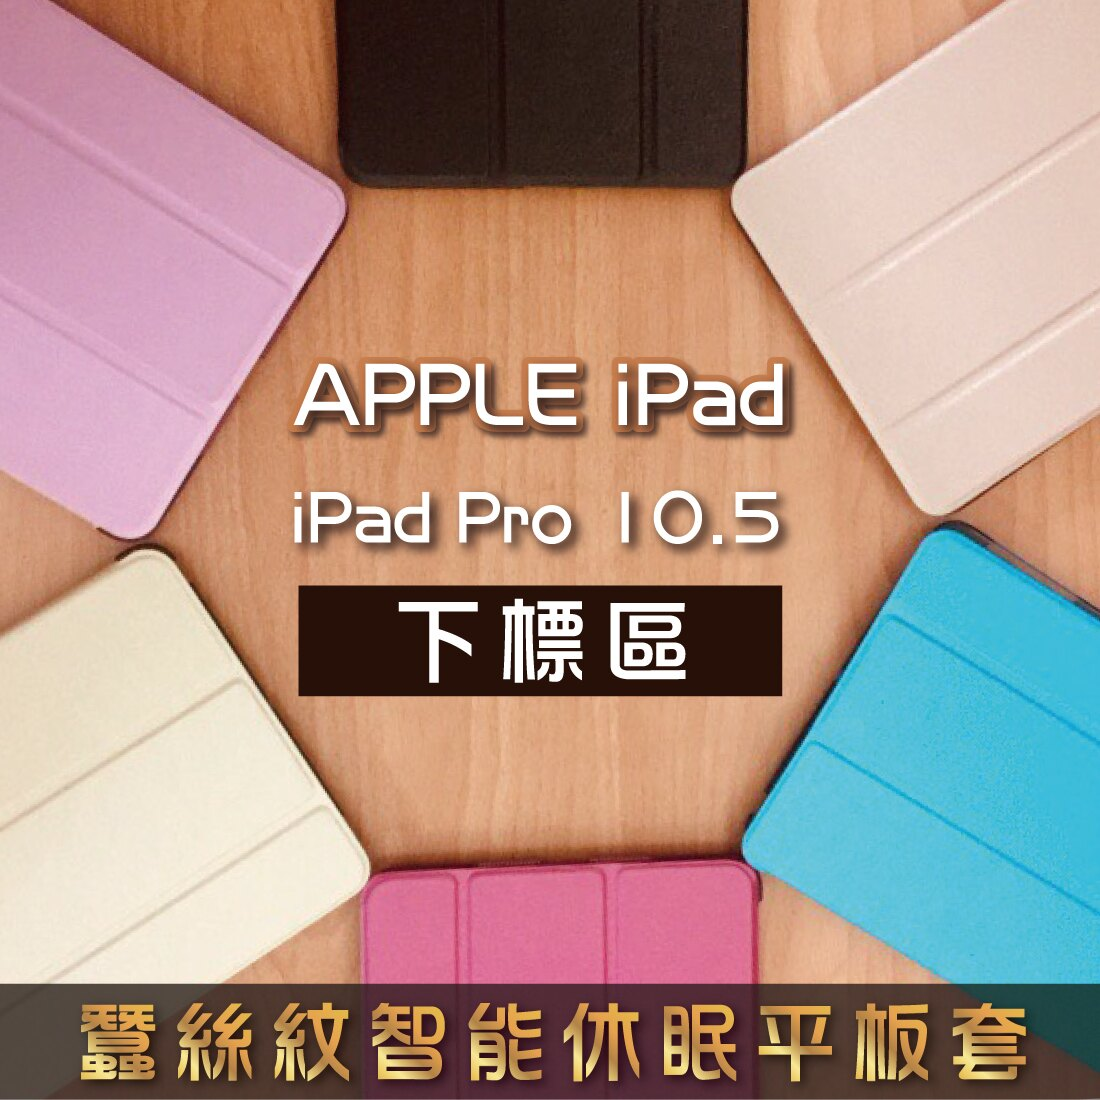 iPad Pro 10.5 蠶絲紋智能休眠三折立架平板套 A1701 A1709 平板保護套 另售鋼化玻璃貼 滿299免運